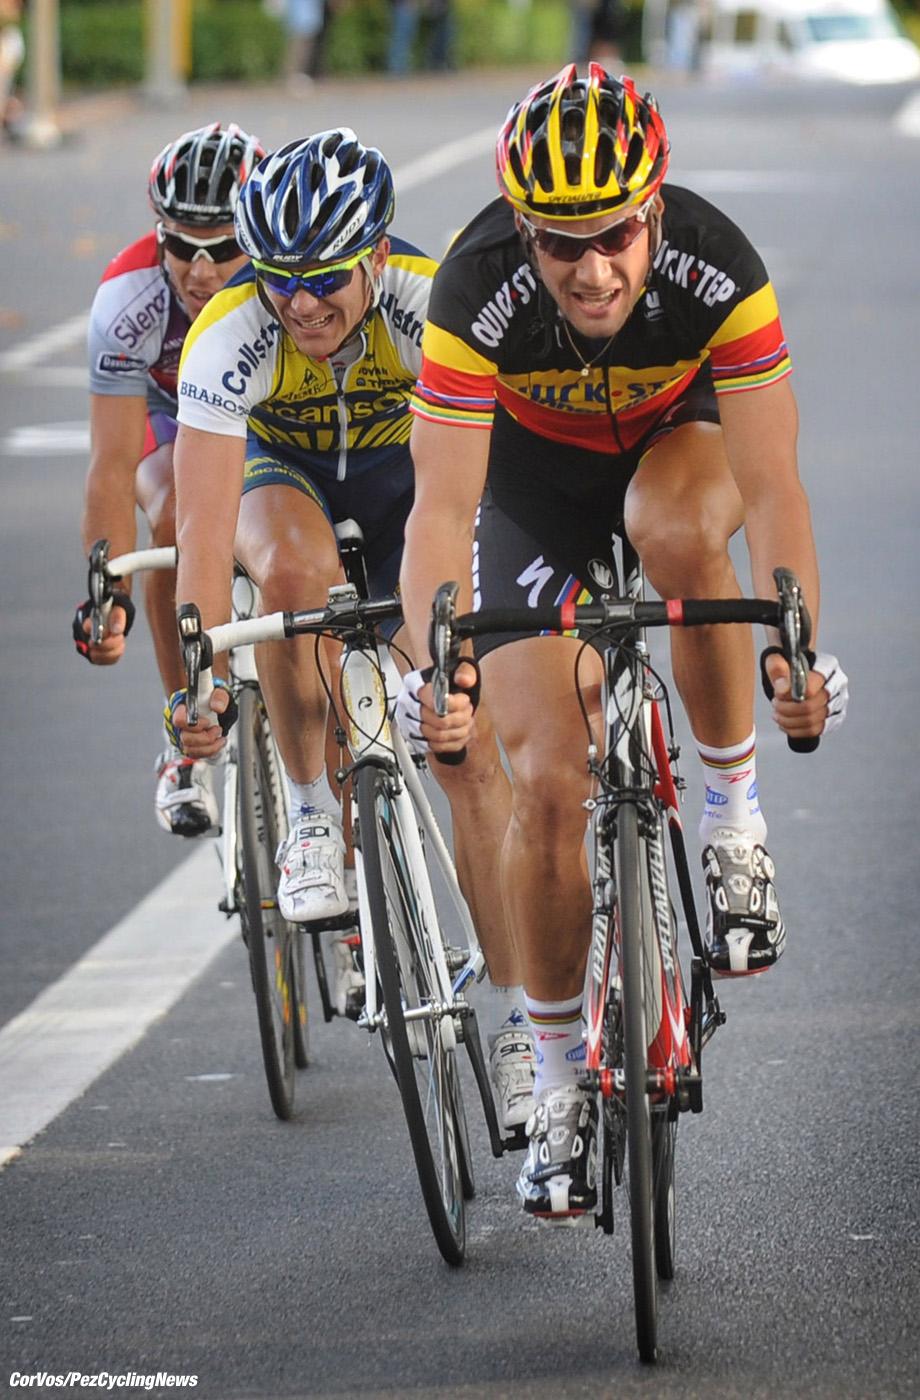 Tours - wielrennen - cycling - radsport - cyclisme - Parijs-Tours - Paris - Tours - Philippe Gilbert (Belgie/ Team Silence - Lotto) -  Tom Boonen (Belgie / Team Quick Step - Quickstep) - Borut Bozic (Slovenie / Team Vacansoleil) - foto Cor Vos ©2009